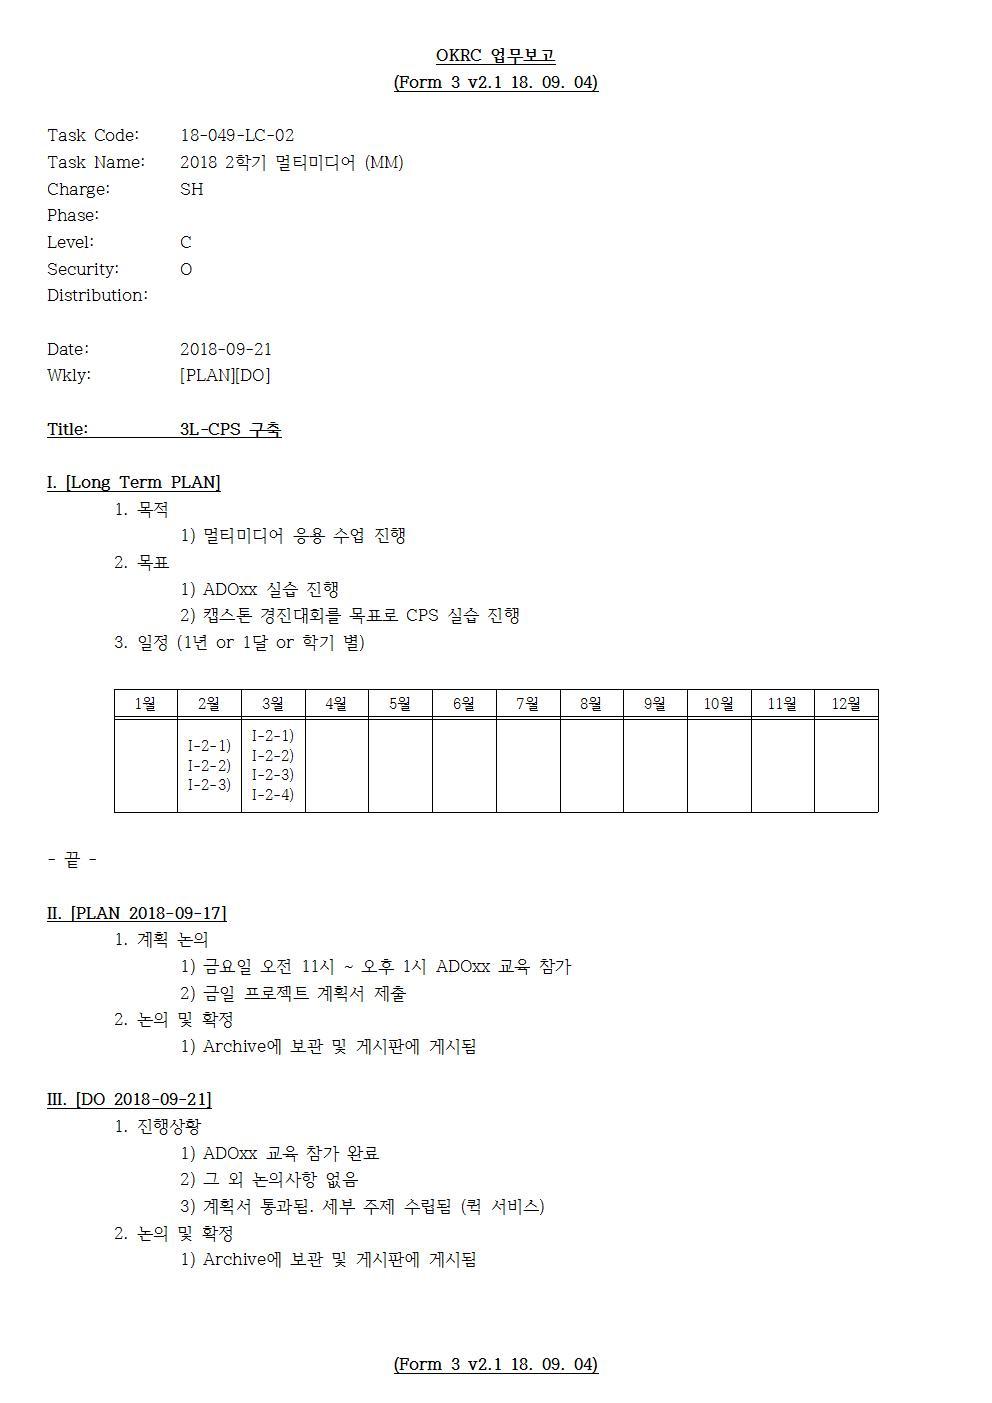 D-[18-049-LC-02]-[MM]-[2018-09-21][SH]001.jpg